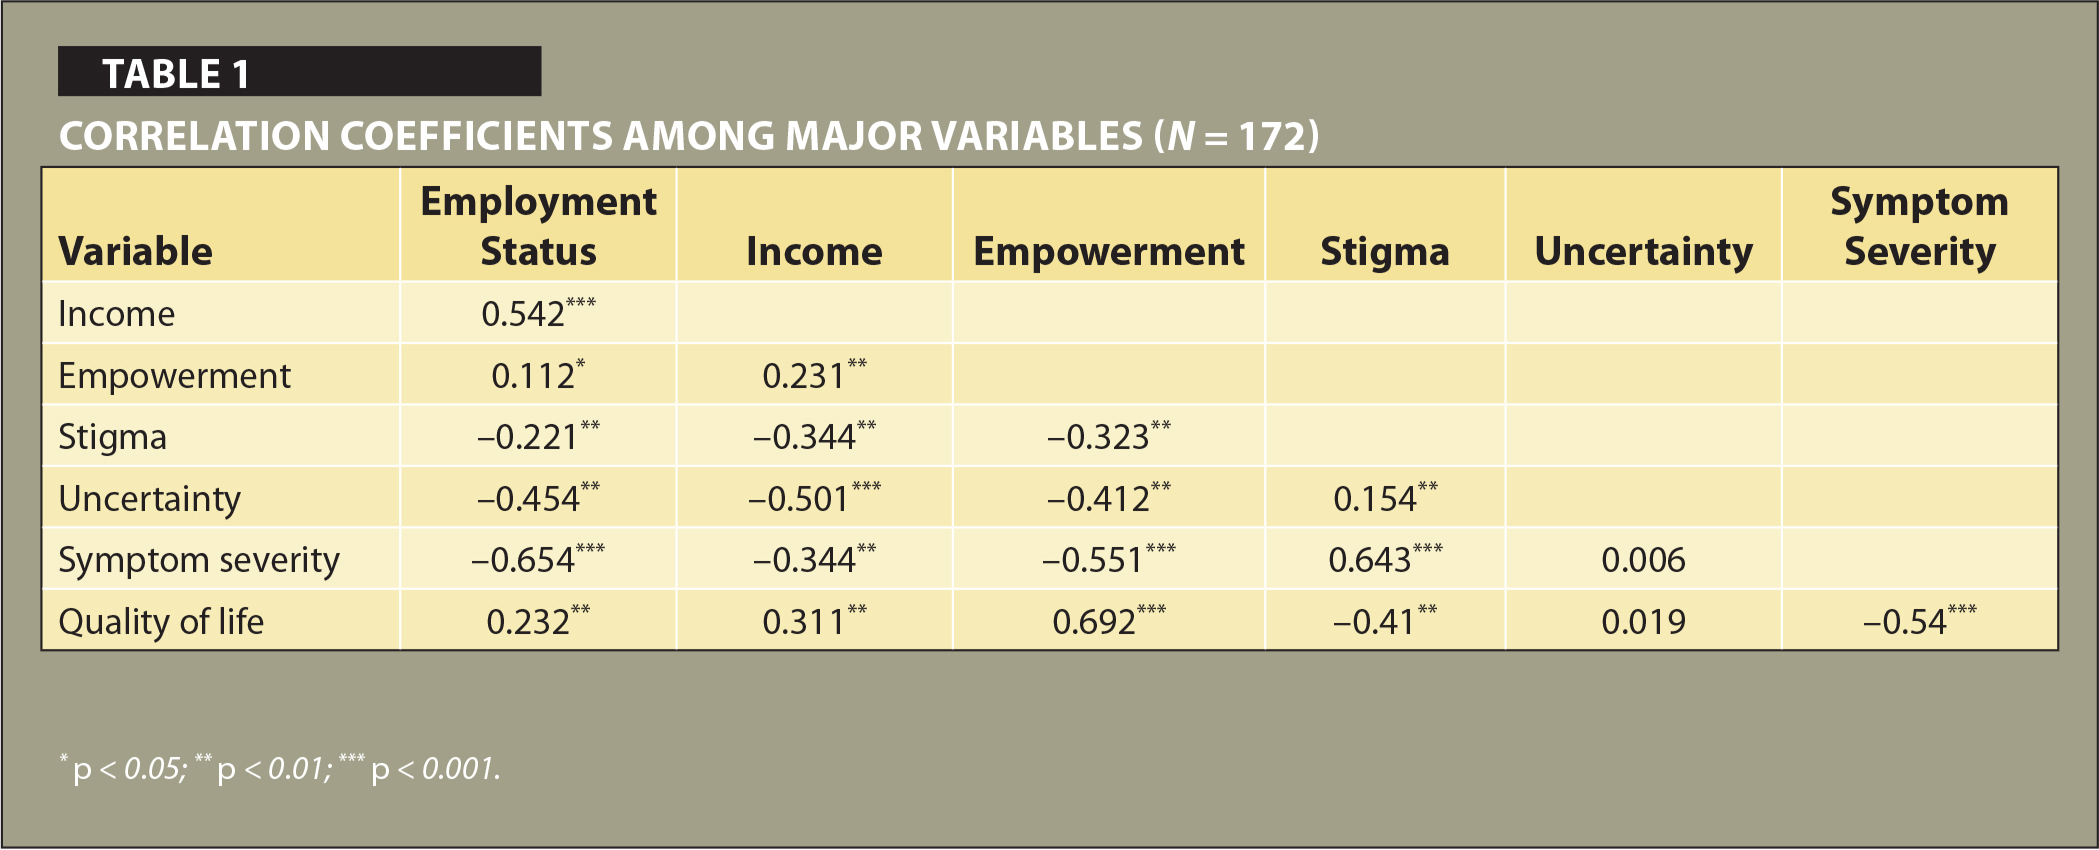 Correlation Coefficients among Major Variables (N = 172)